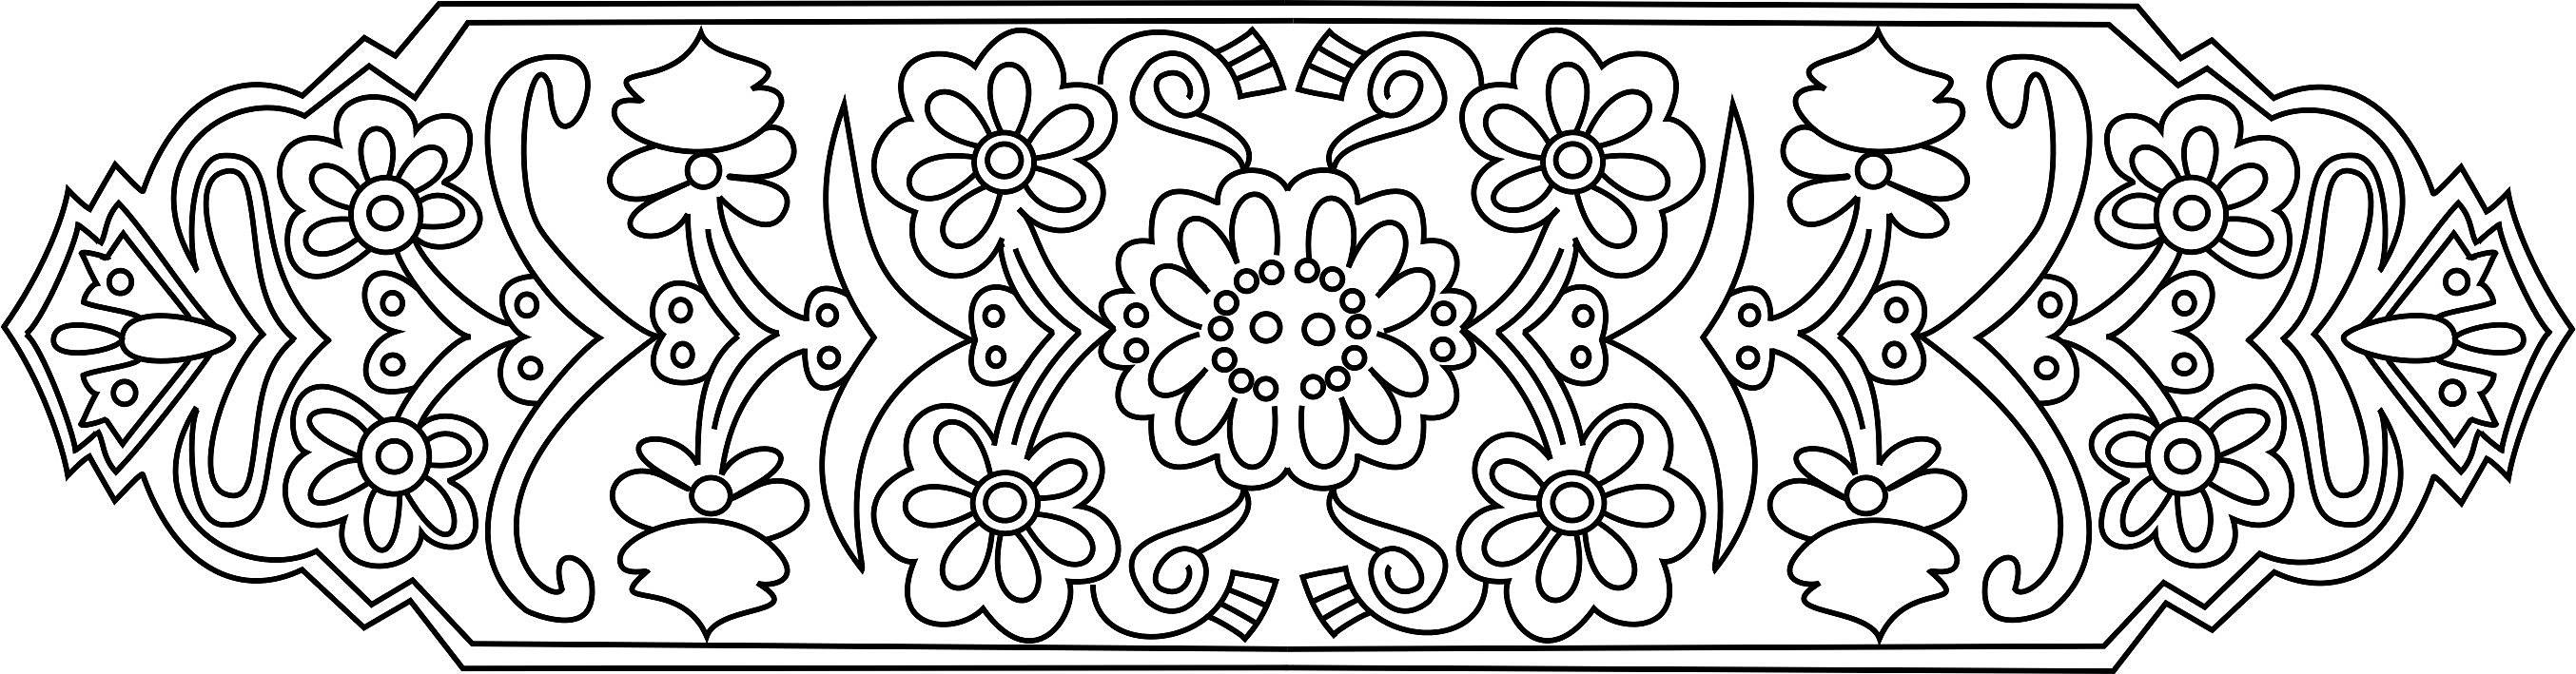 Татарские орнаменты раскраска